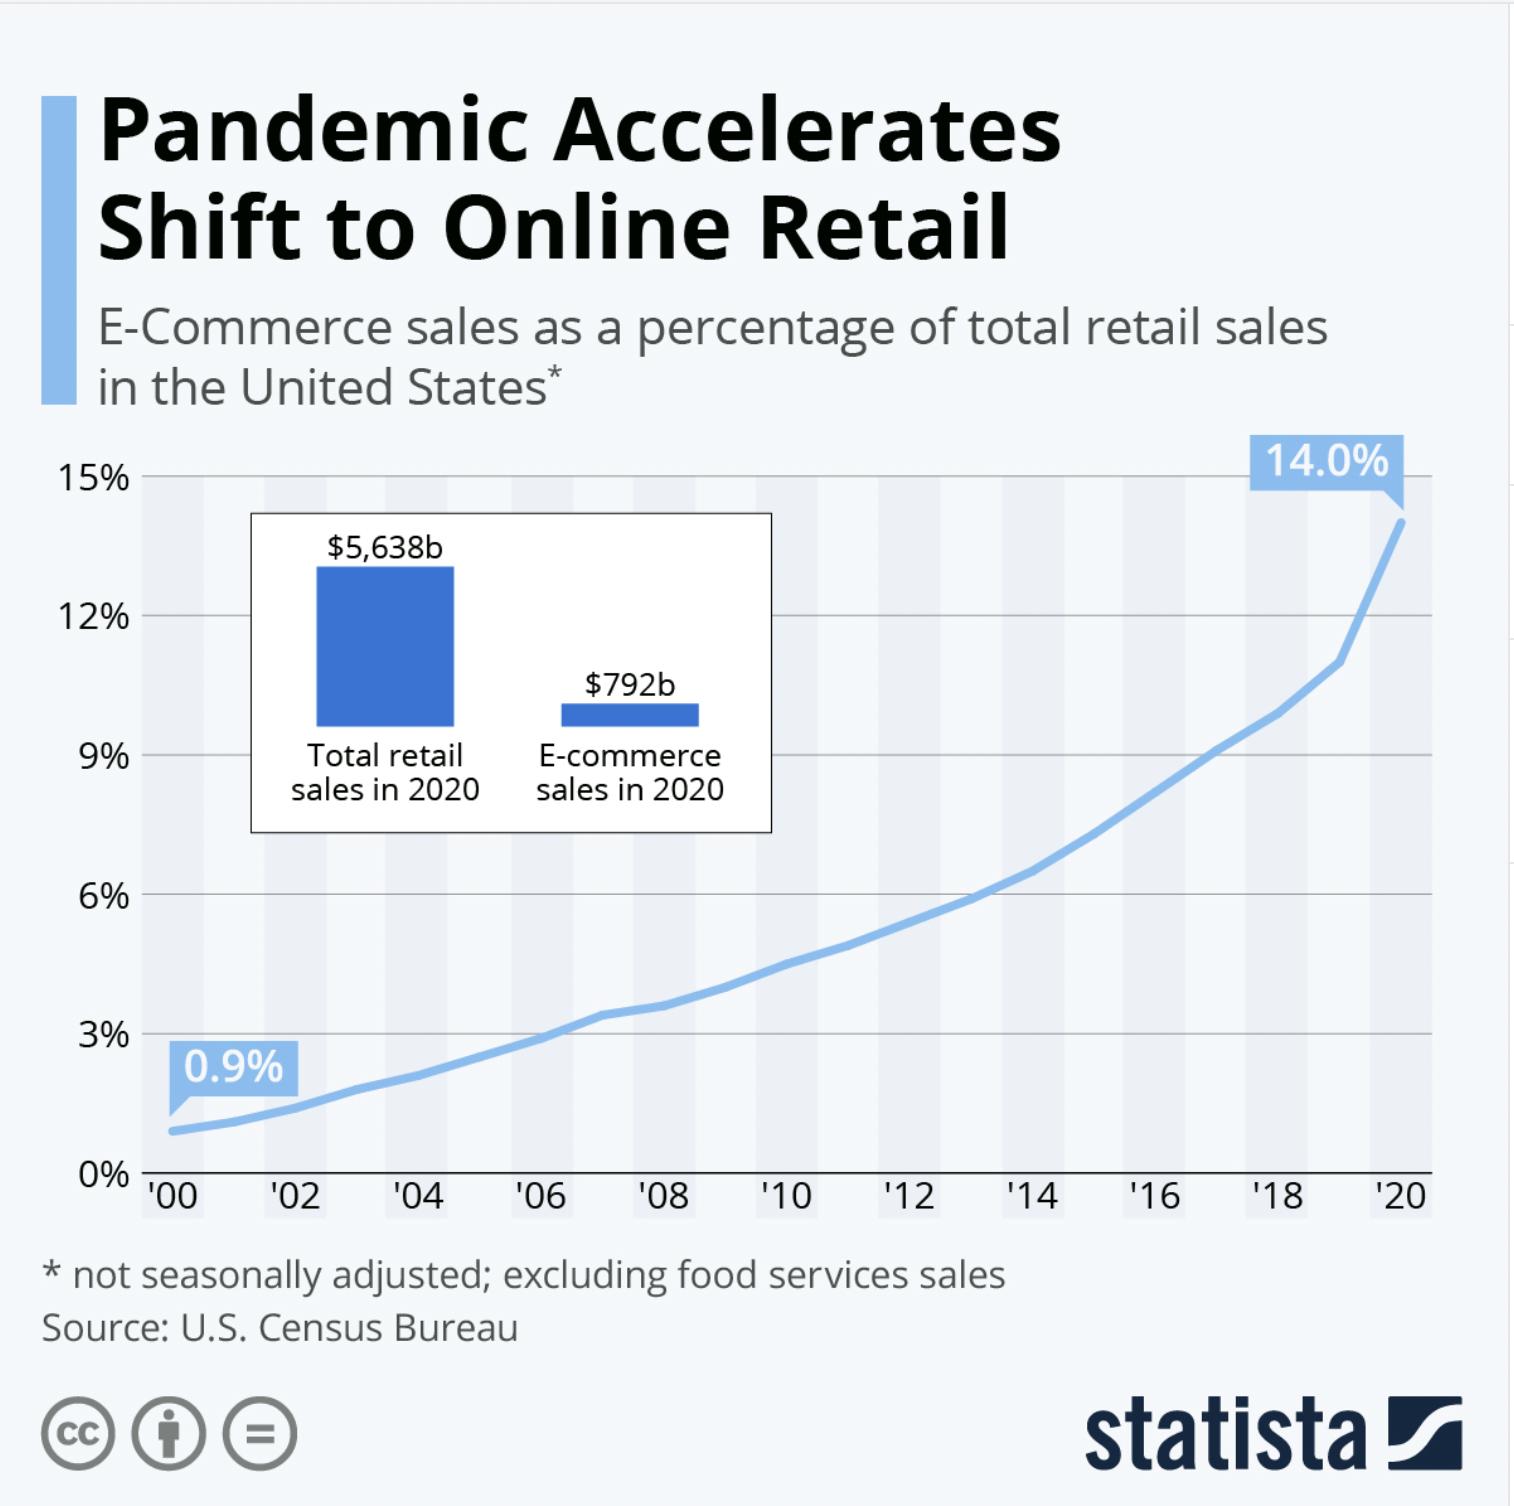 Pandemic Accelerates